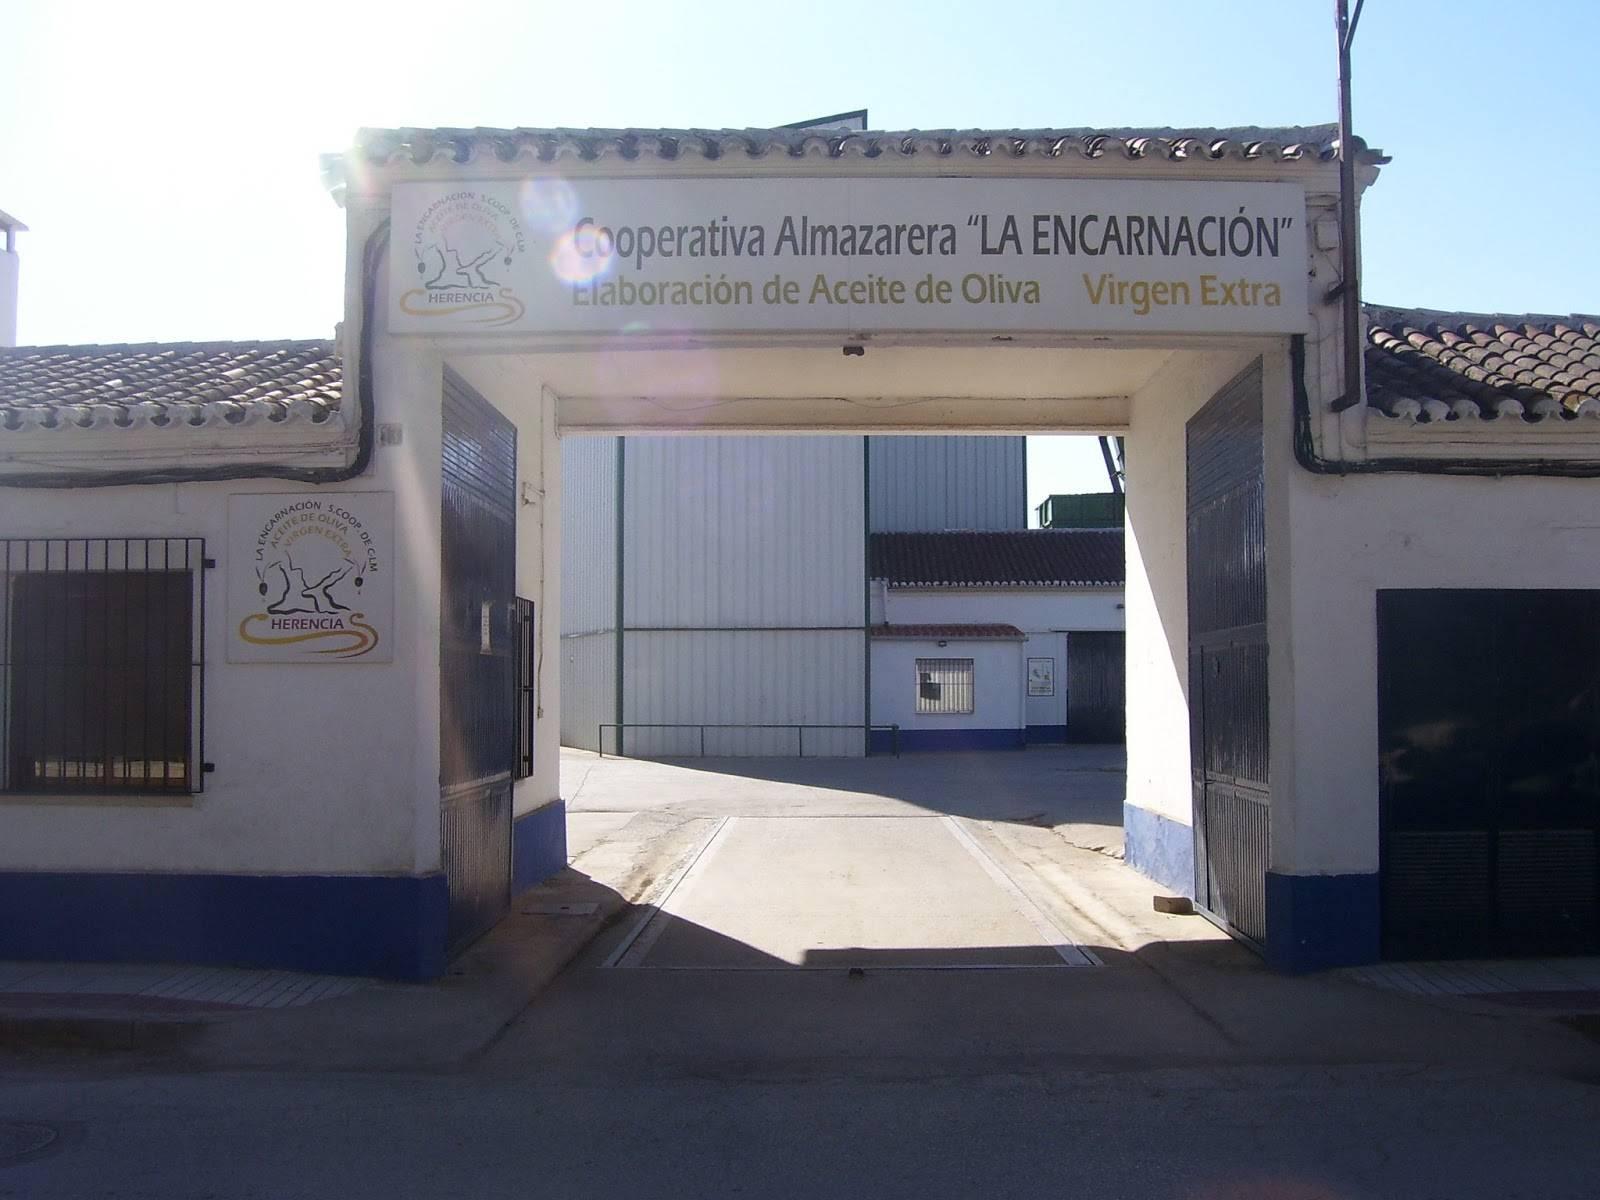 Cooperativa Almazara La Encarnaci%C3%B3n - Herencia, ¿tres cooperativas?